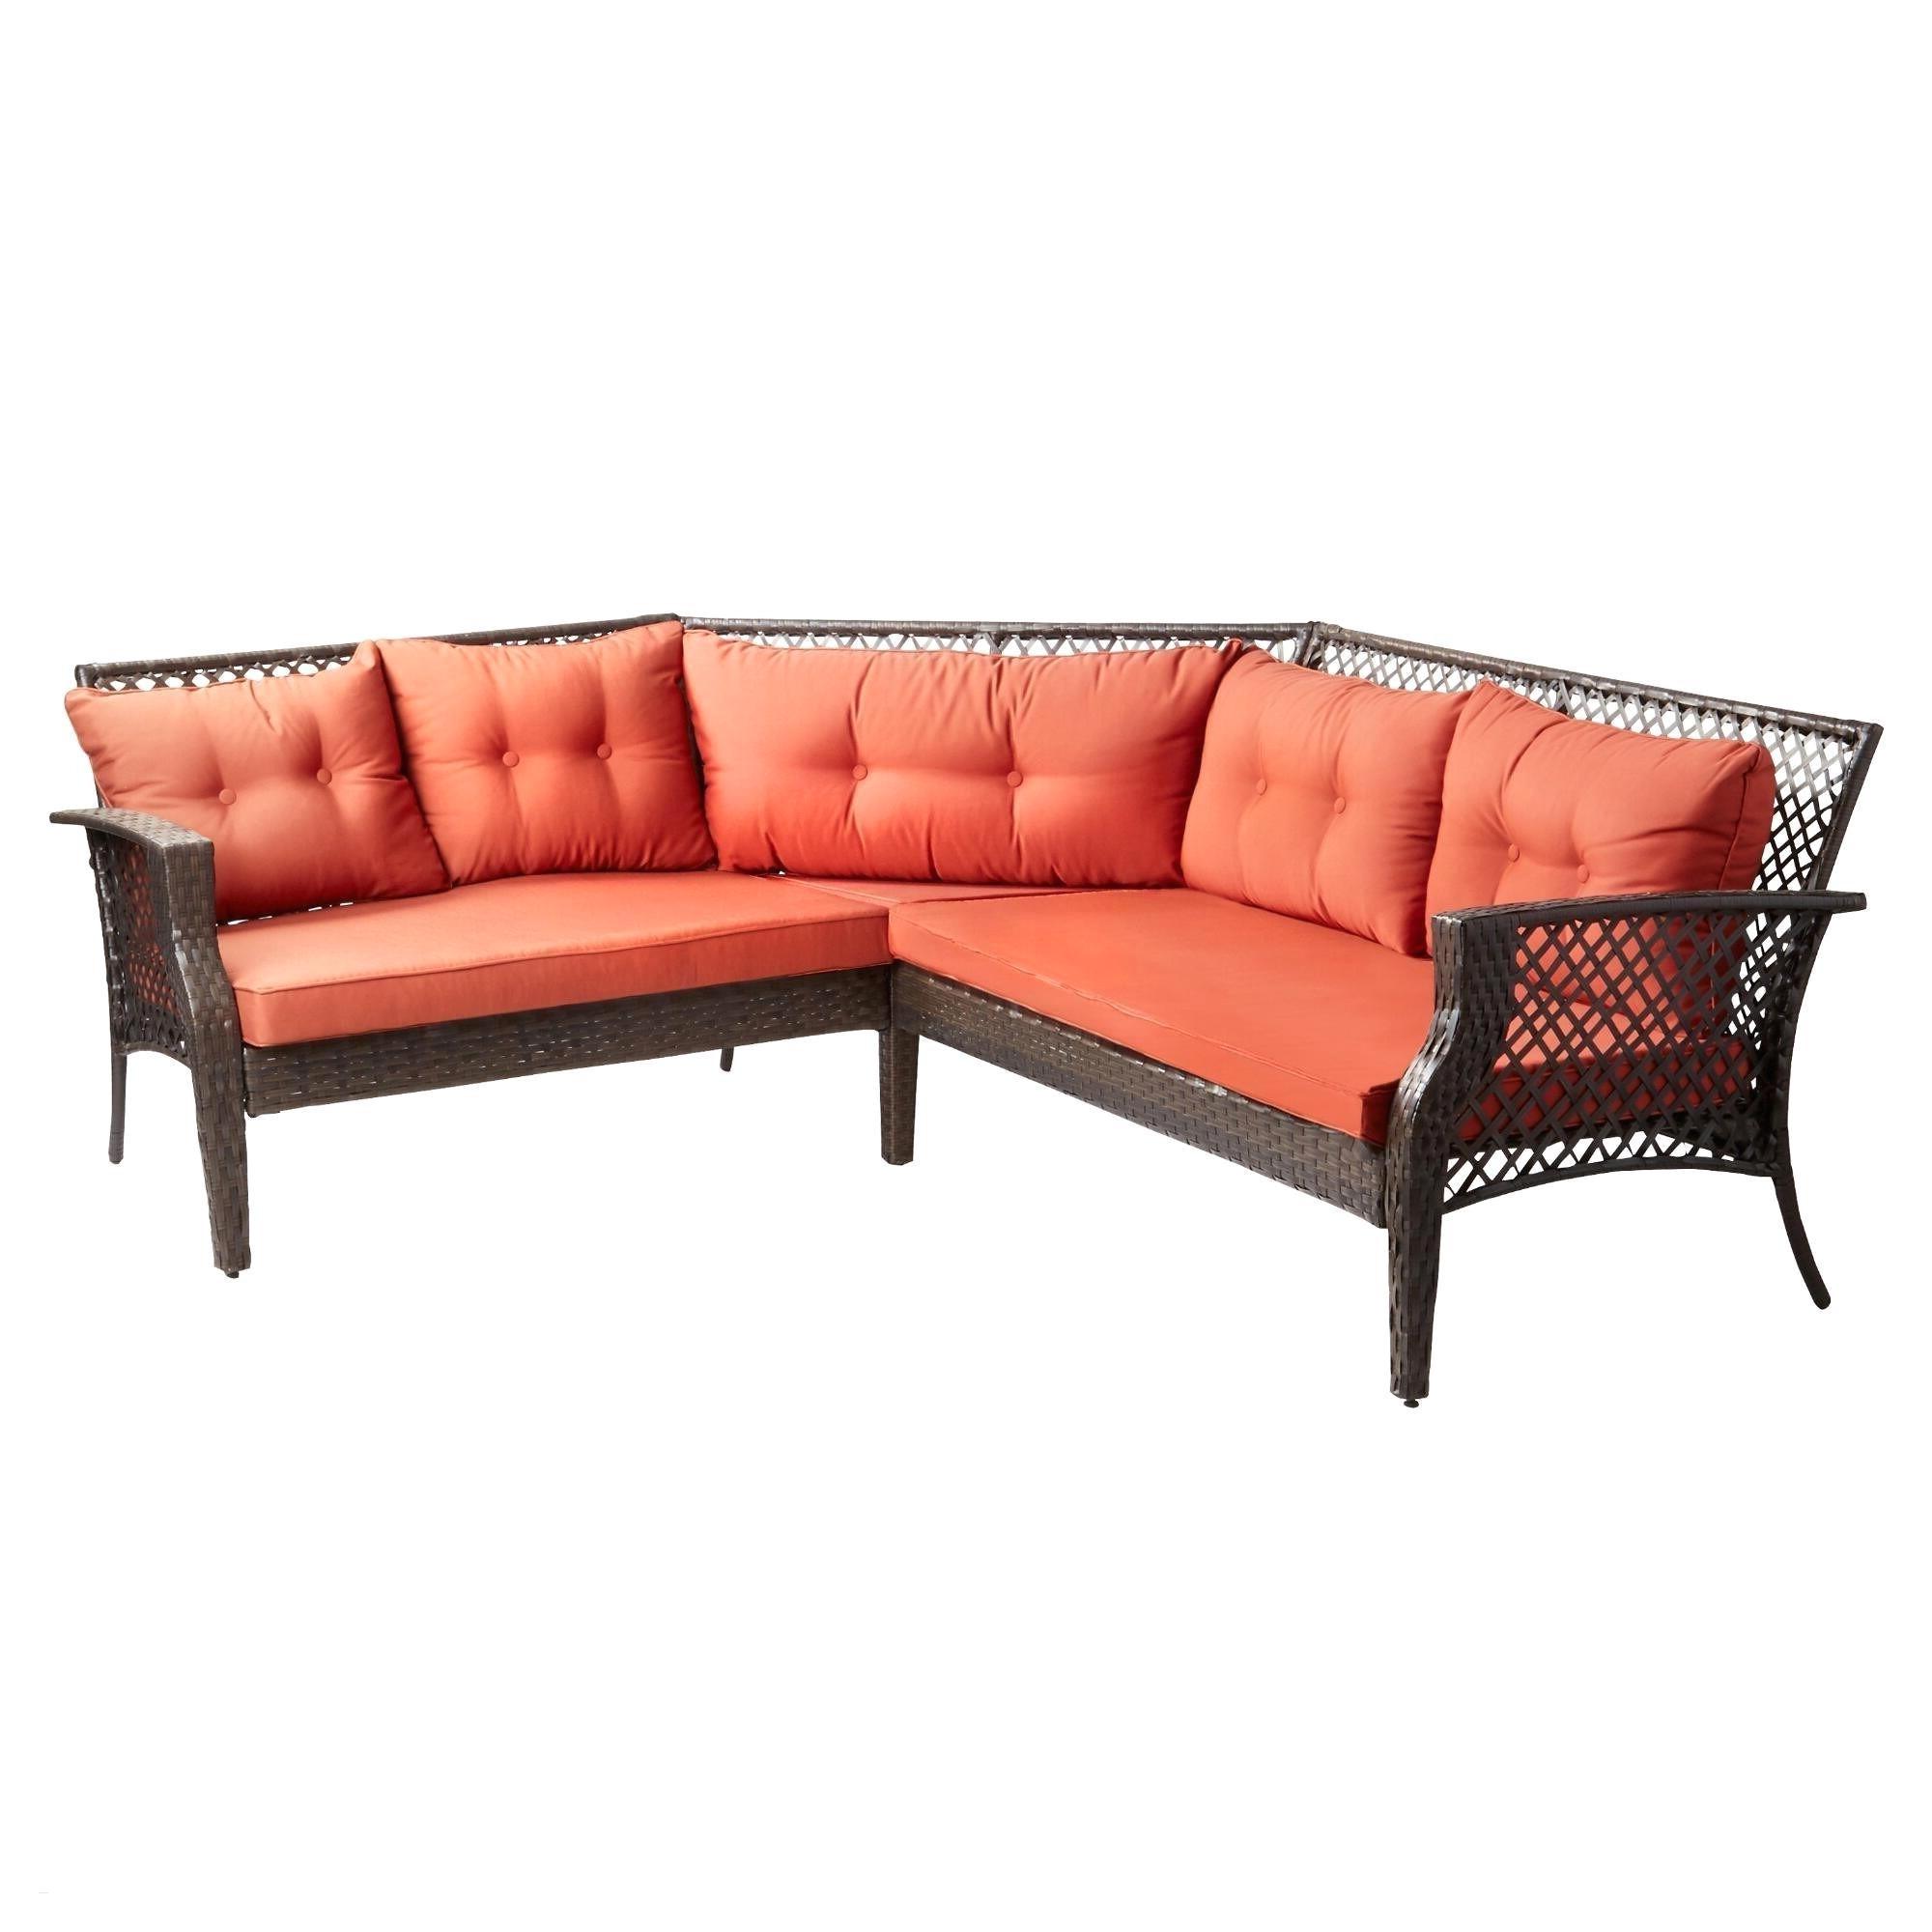 suns furniture tulsa elegant 30 amazing round outdoor sectional ideas onionskeen